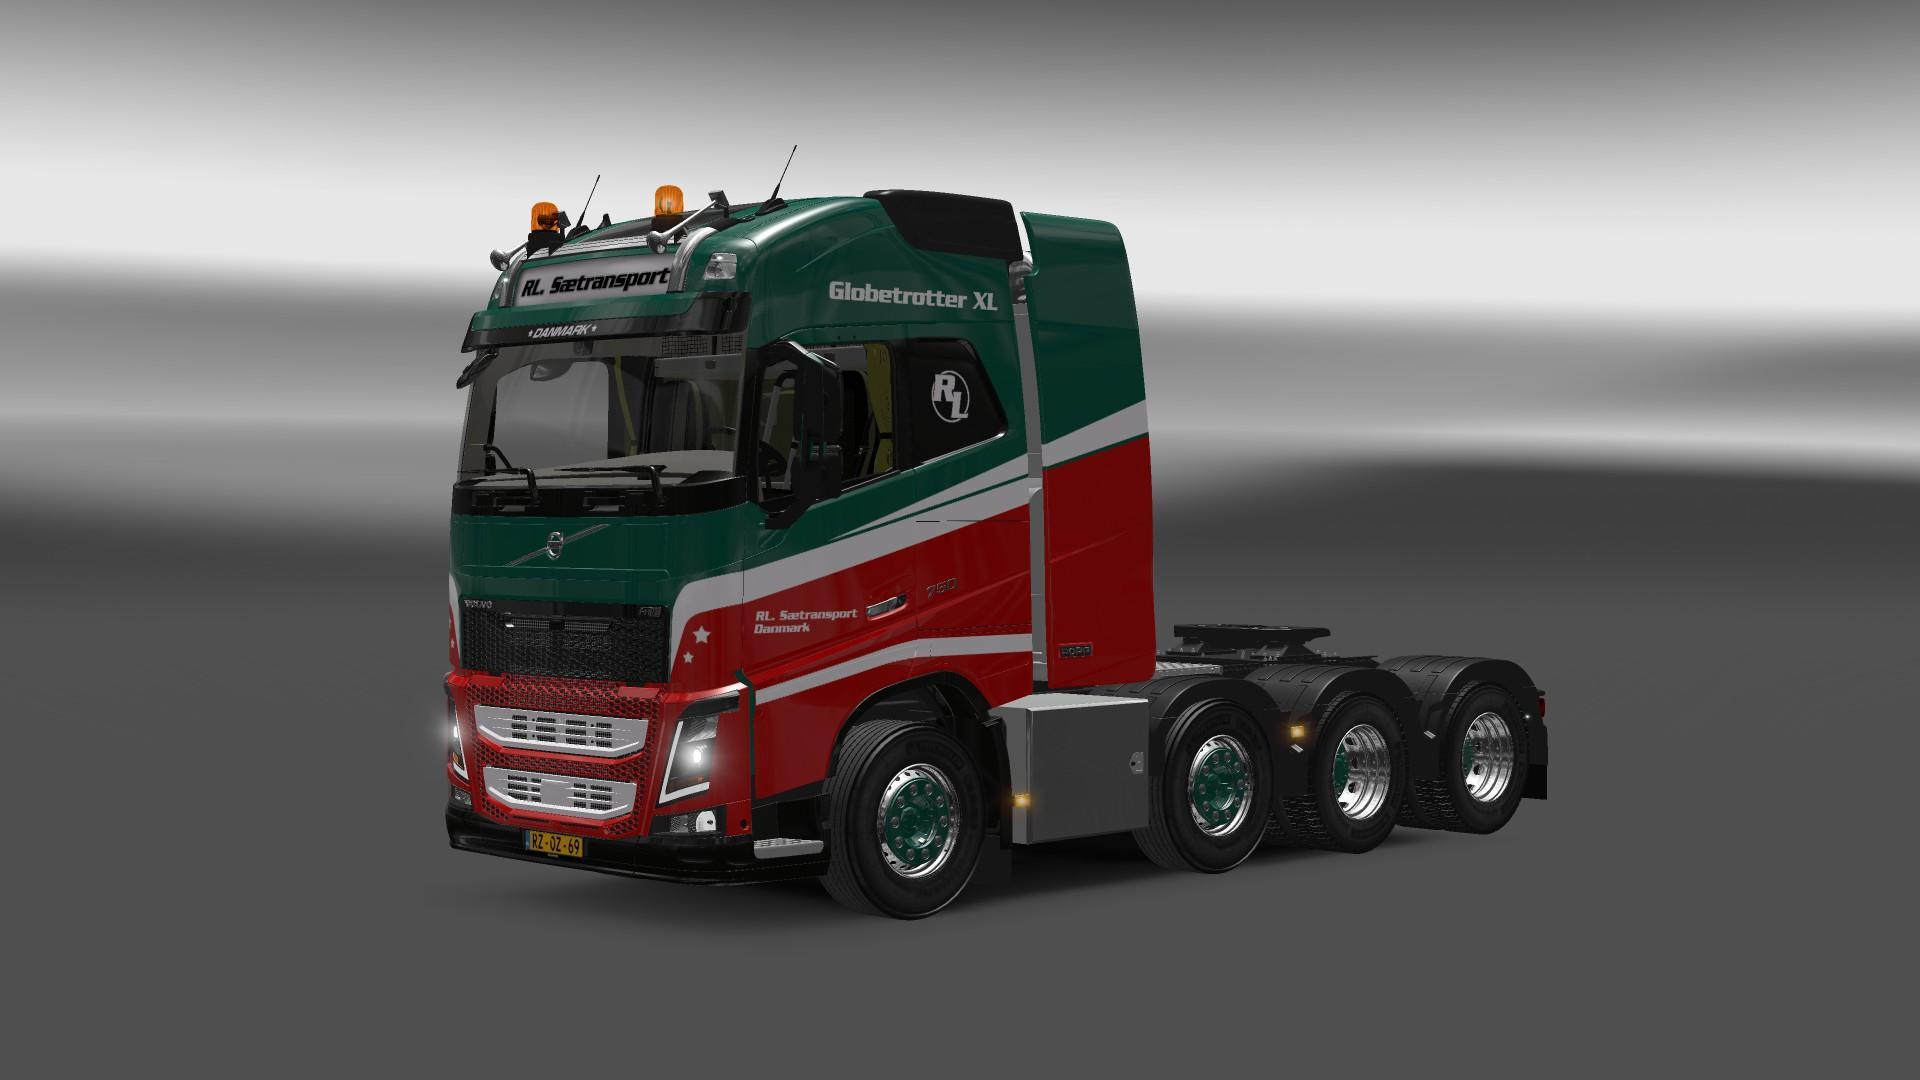 Volvo Fh 2013 8x4 1 22 Truck Euro Truck Simulator 2 Mods